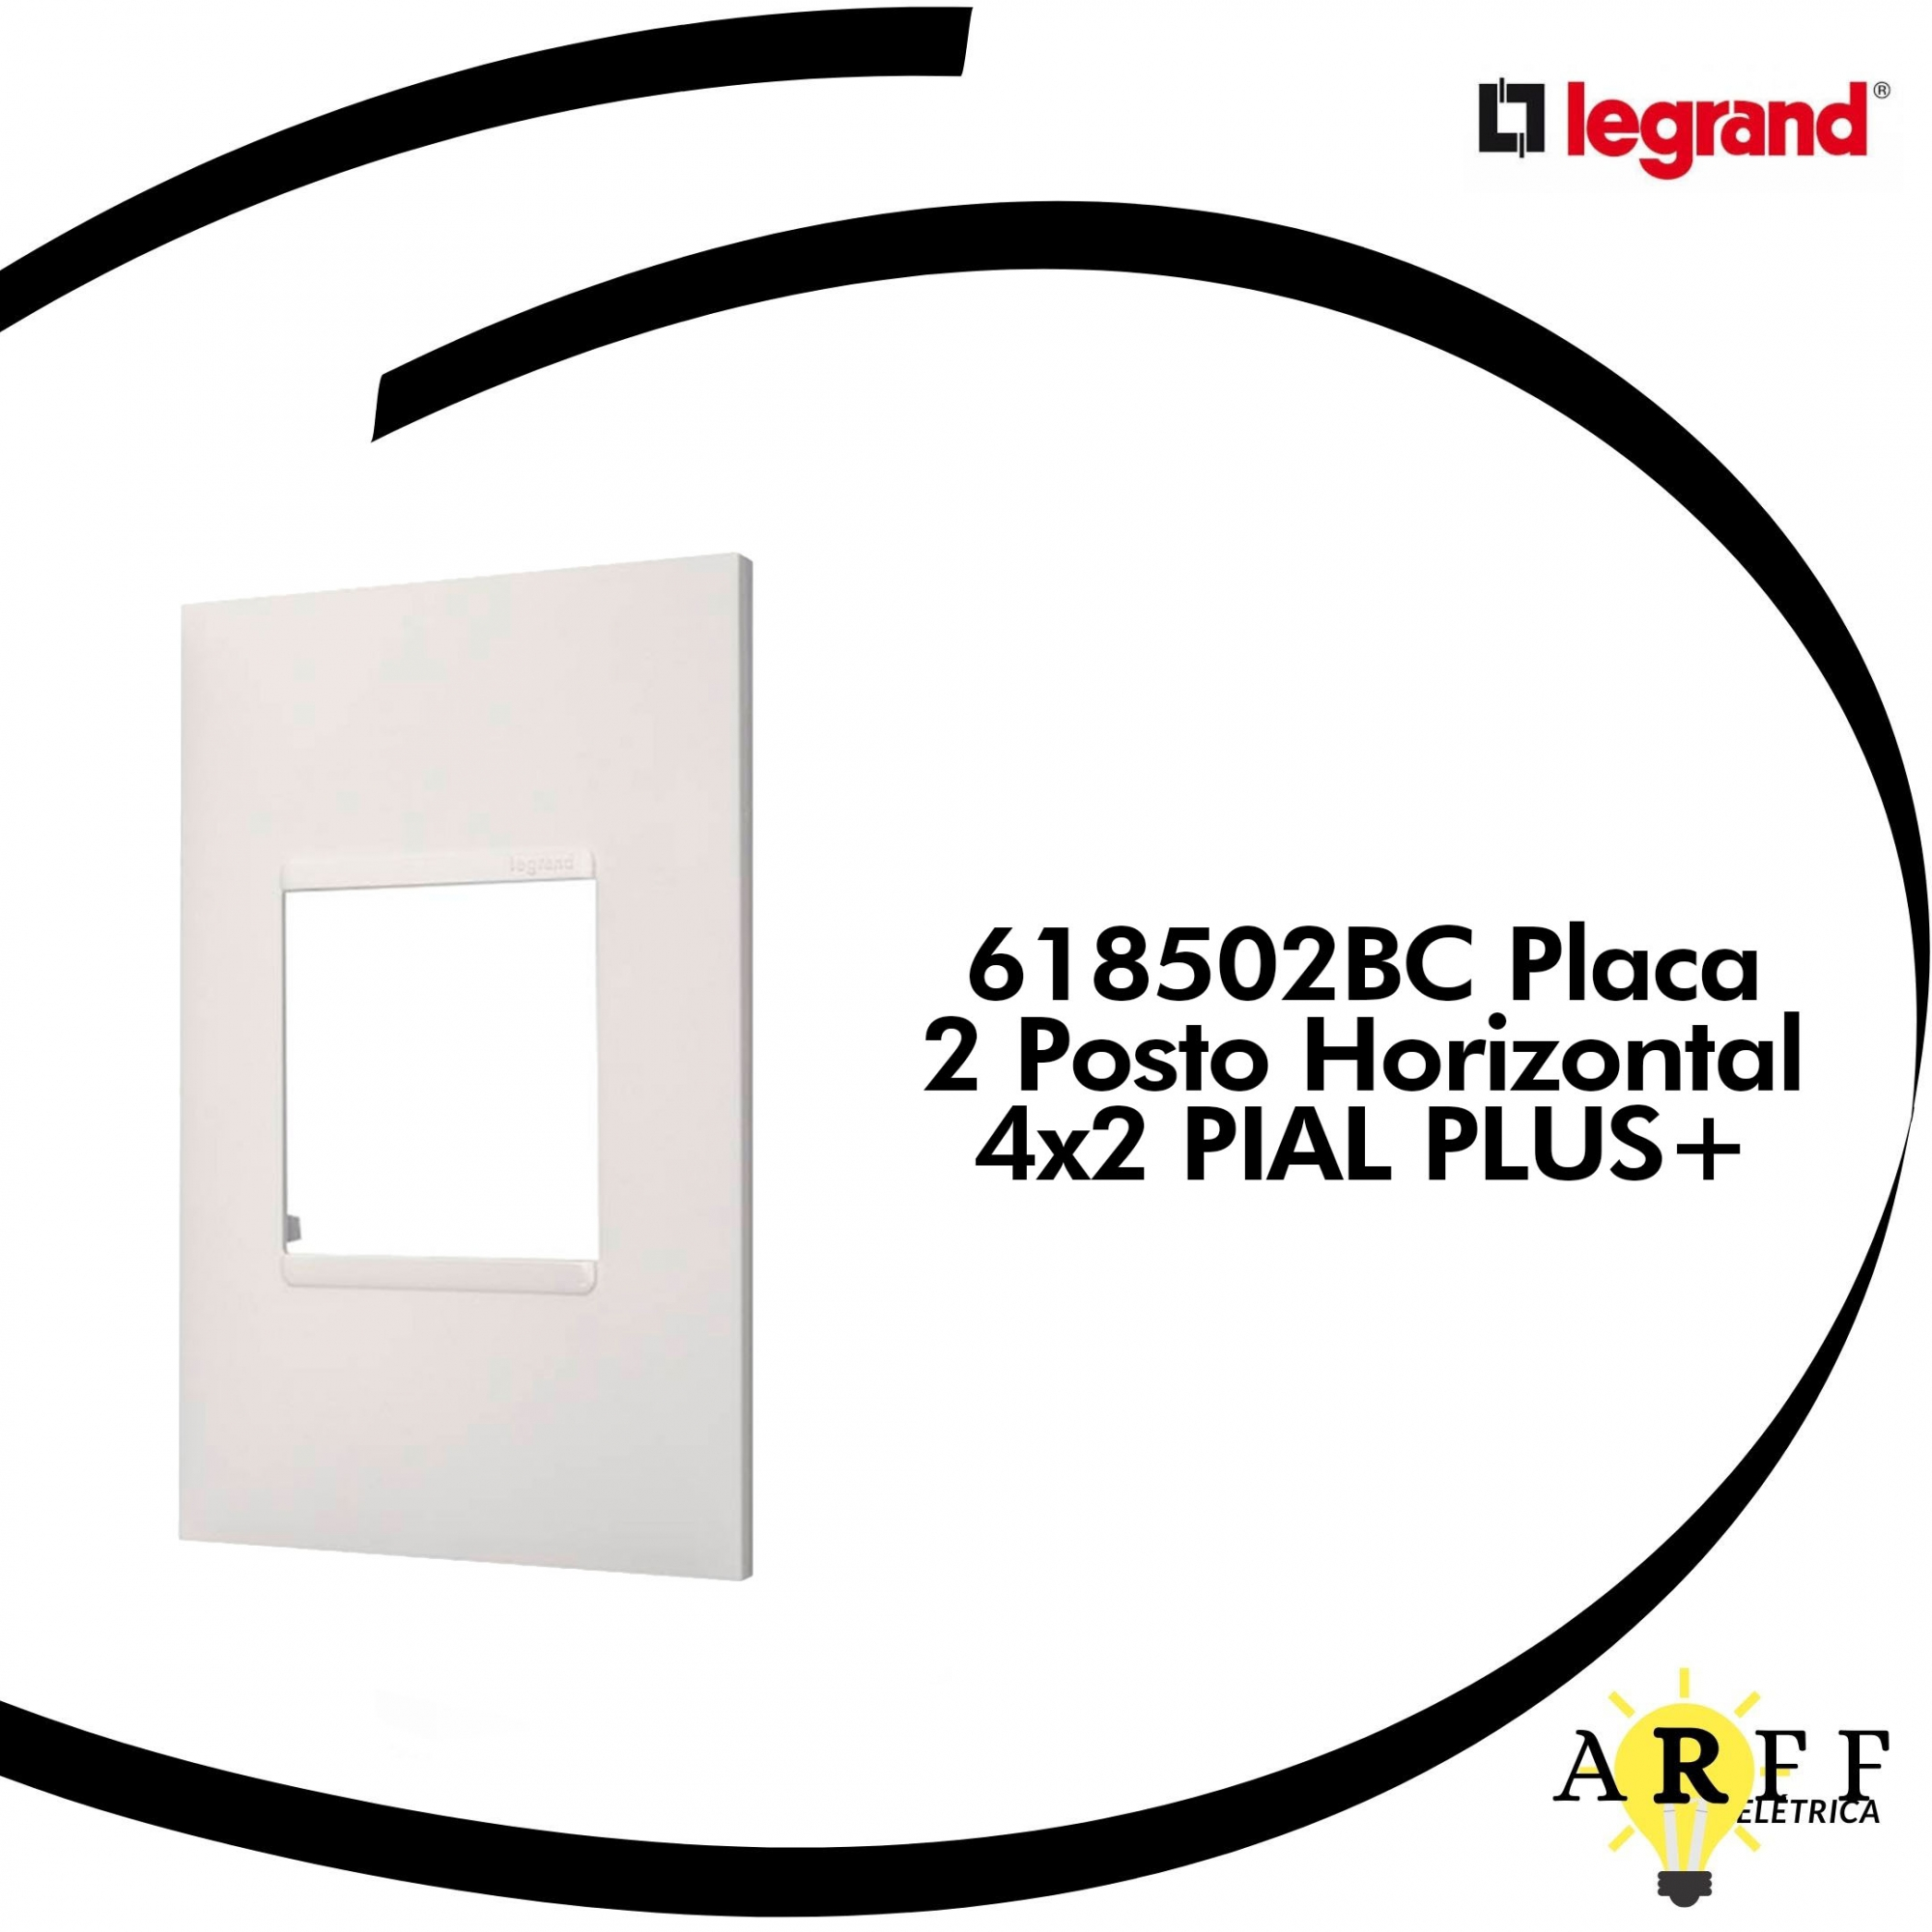 618502BC Placa  2 Posto Horizontal 4x2 PIAL PLUS+